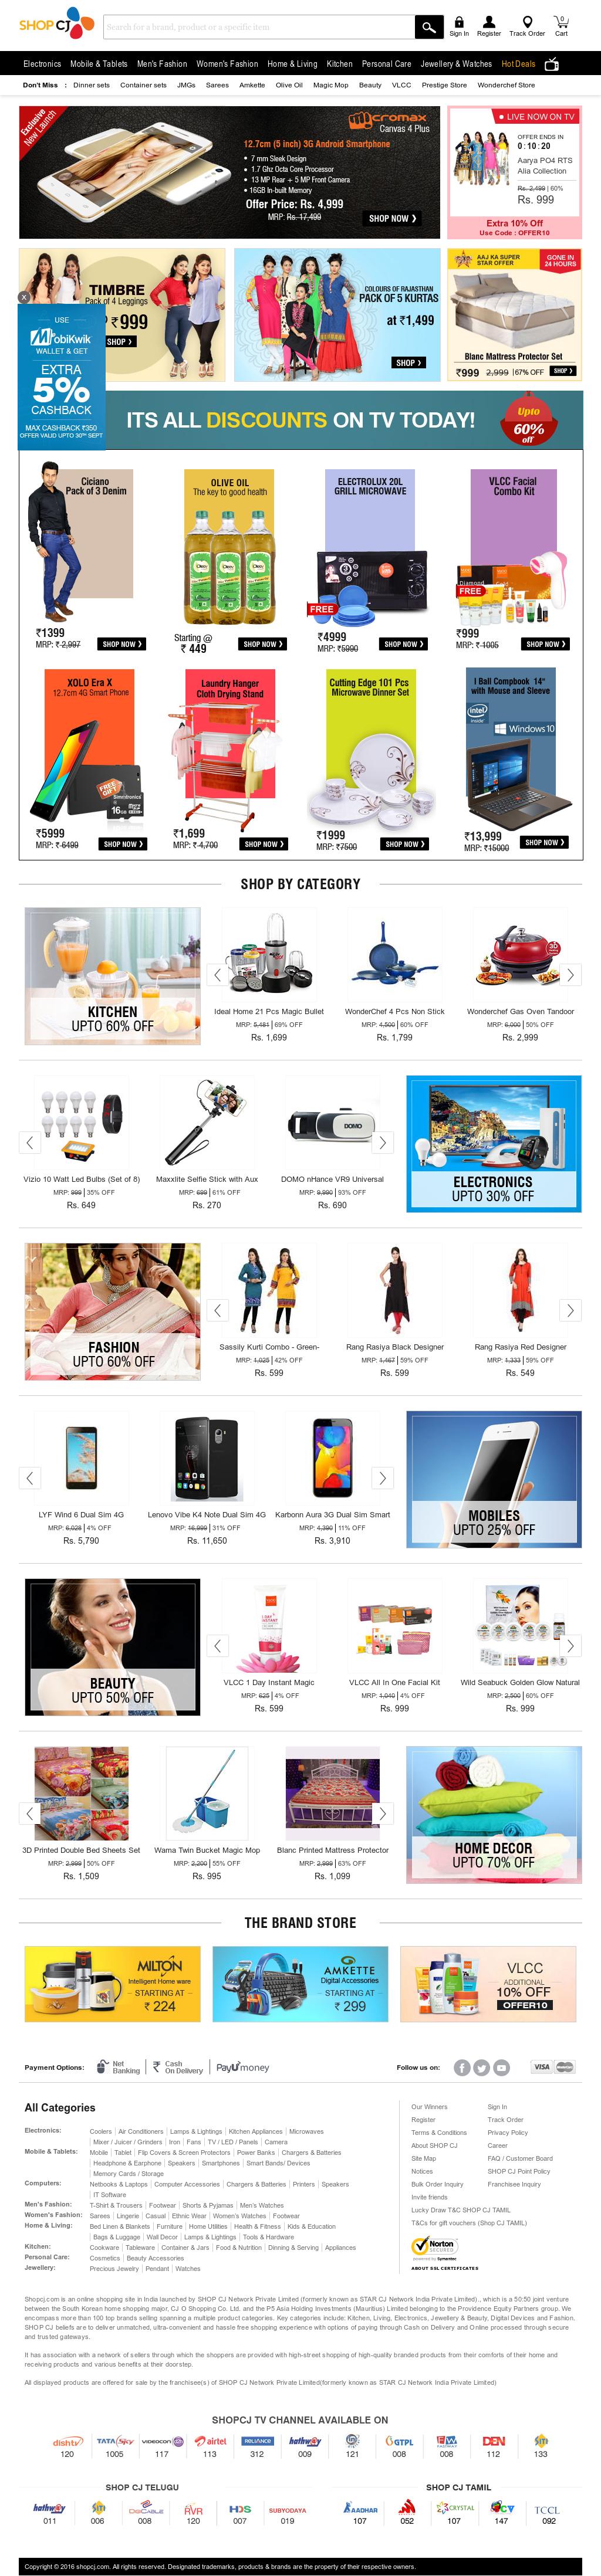 Shop CJ Competitors, Revenue and Employees - Owler Company Profile